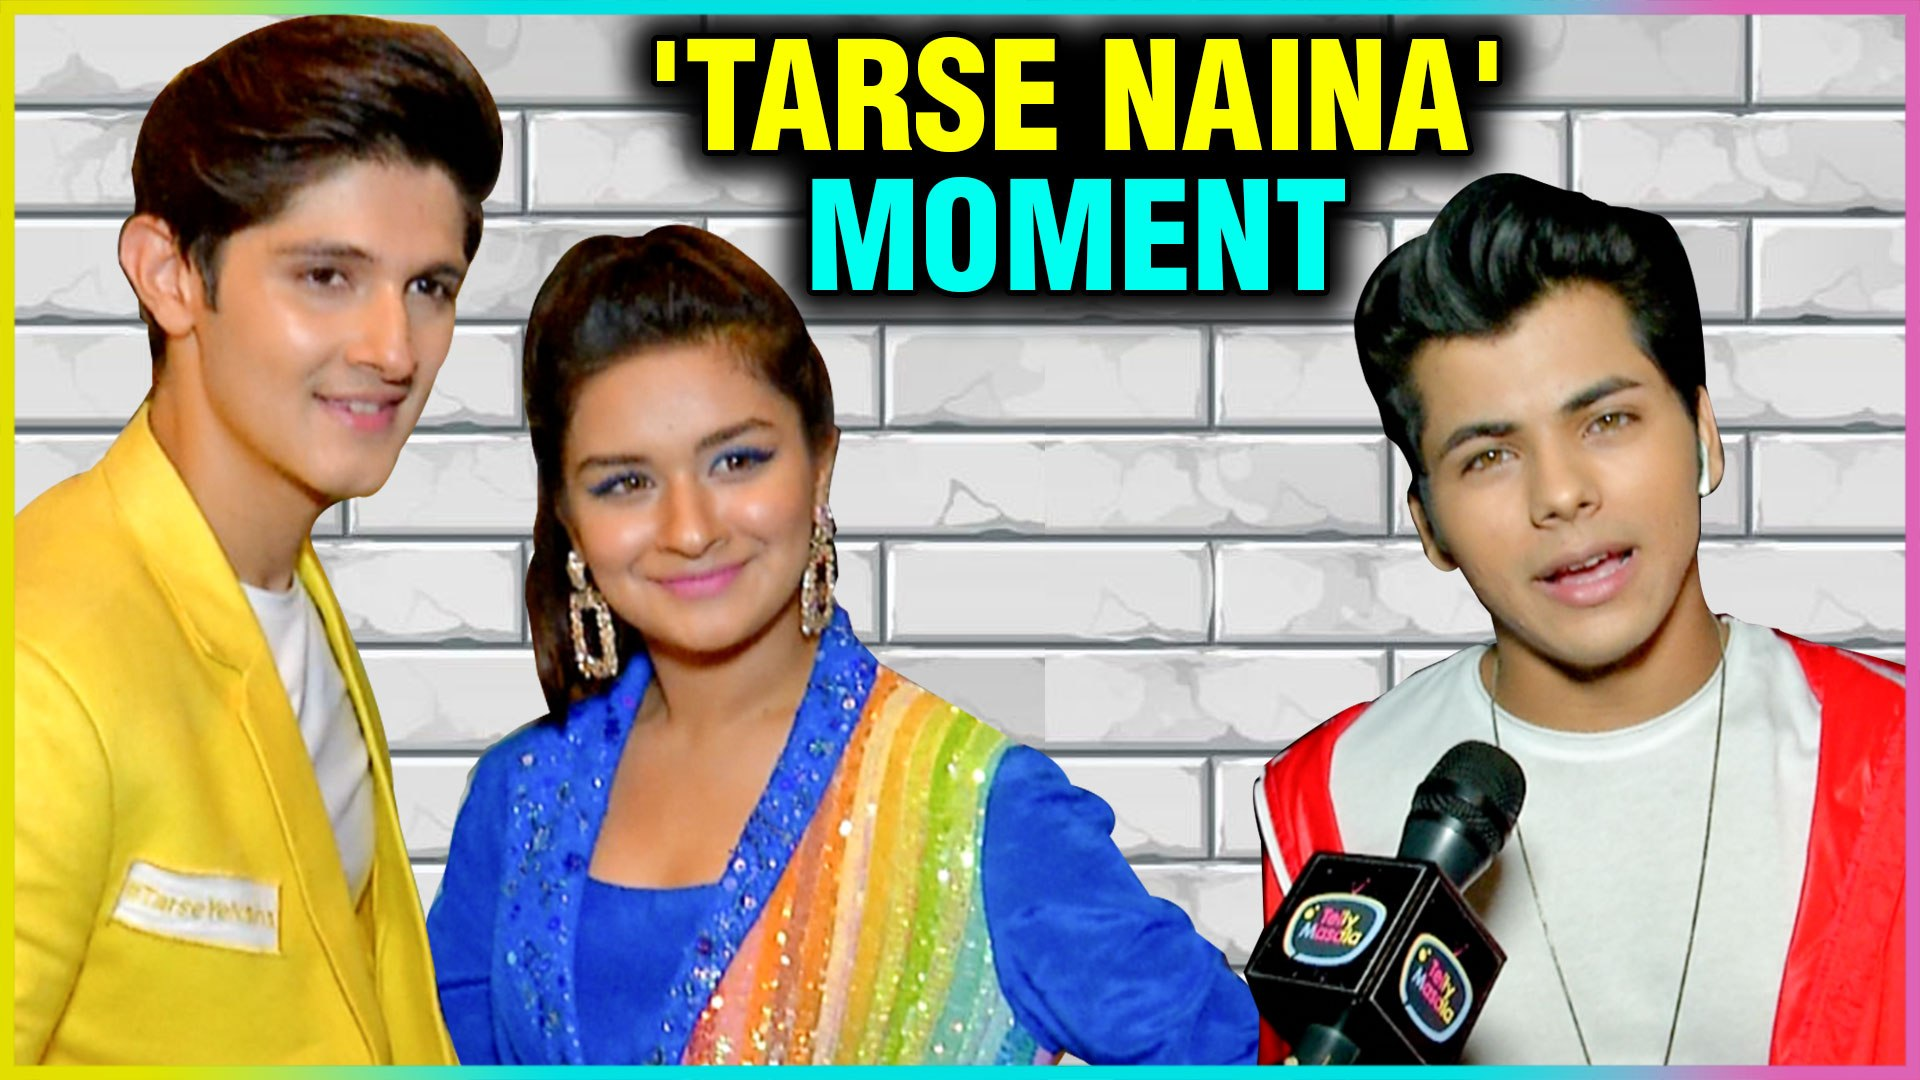 Rohan Mehra, Siddharth Nigam, Avneet Kaur REVEAL Their 'TARSE NAINA' Moment In Life